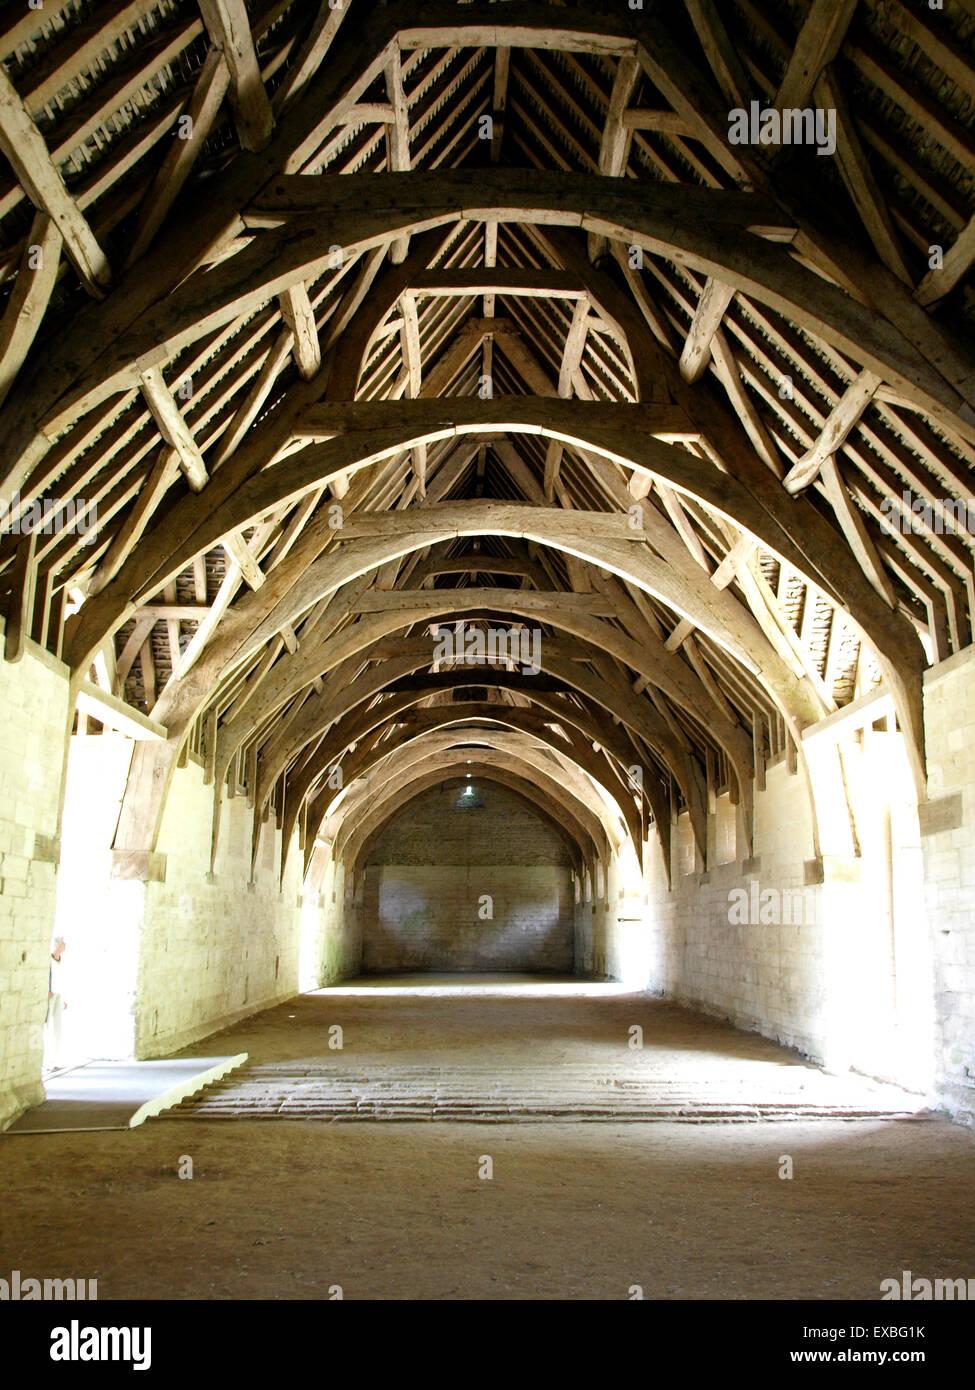 Interior of the 14th century medieval monastic stone barn ...